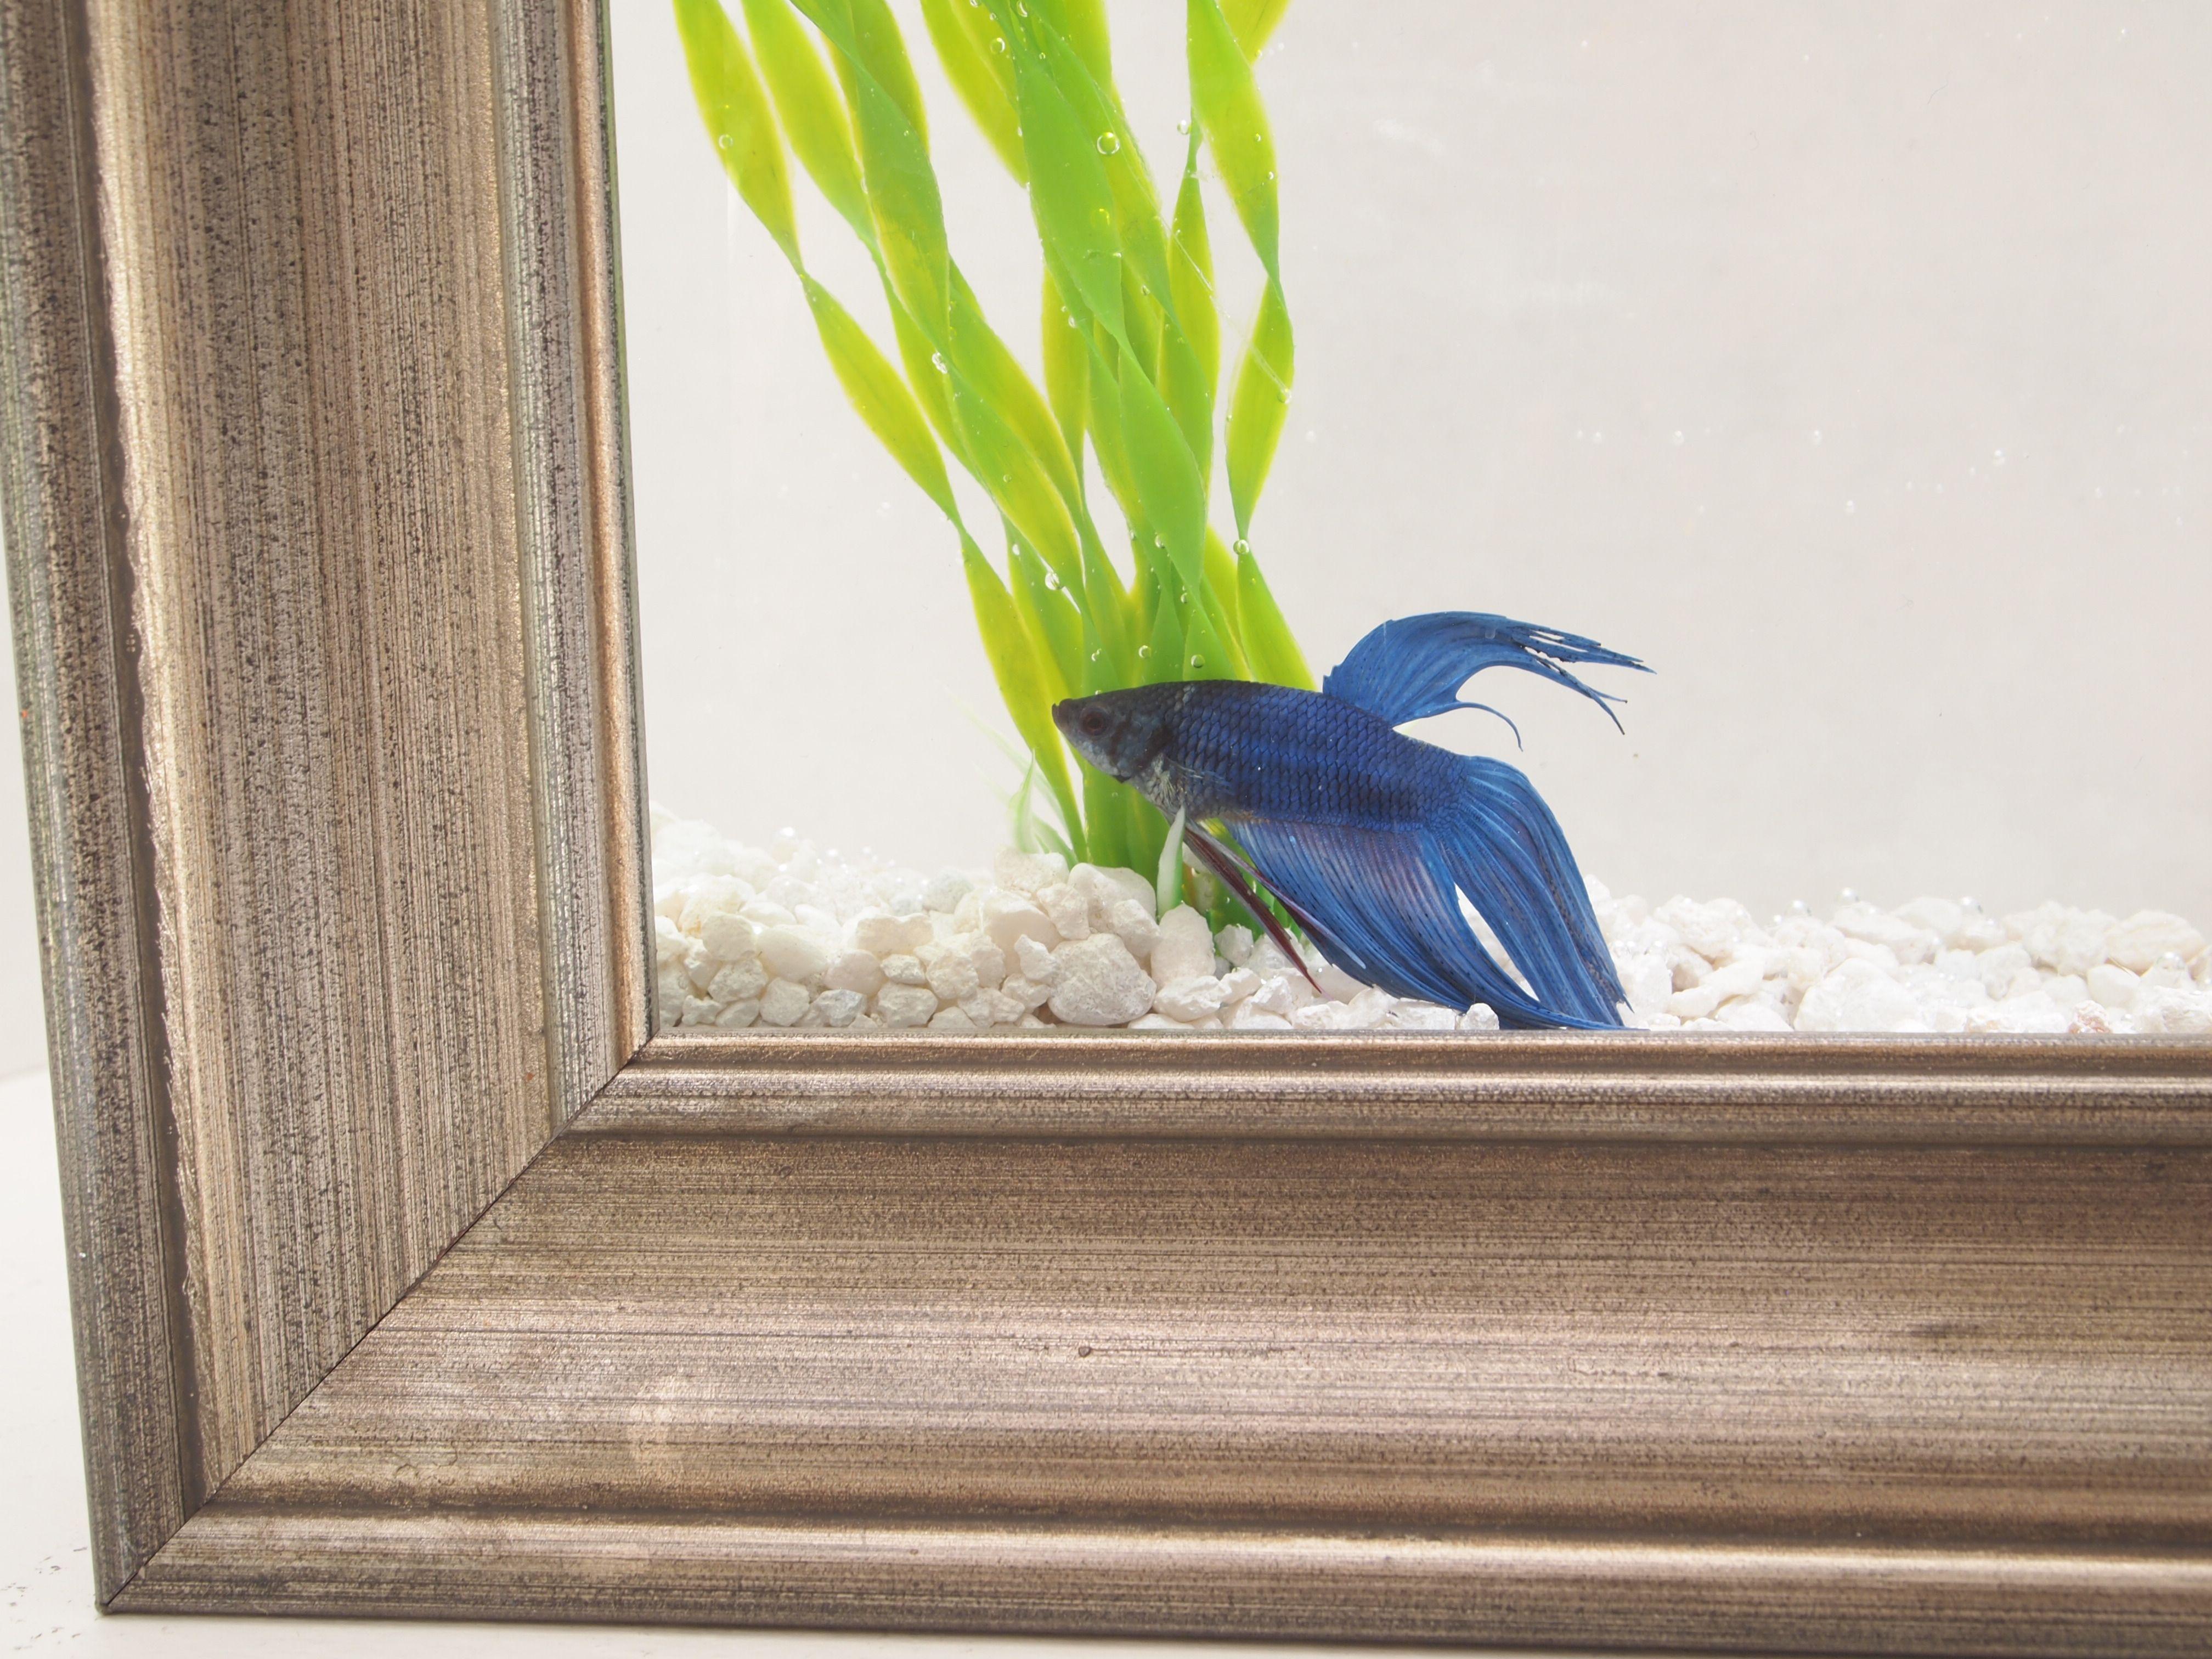 Fish aquarium information - Glitter N Glue Diy Framed Fish Tank Aquarium Betta